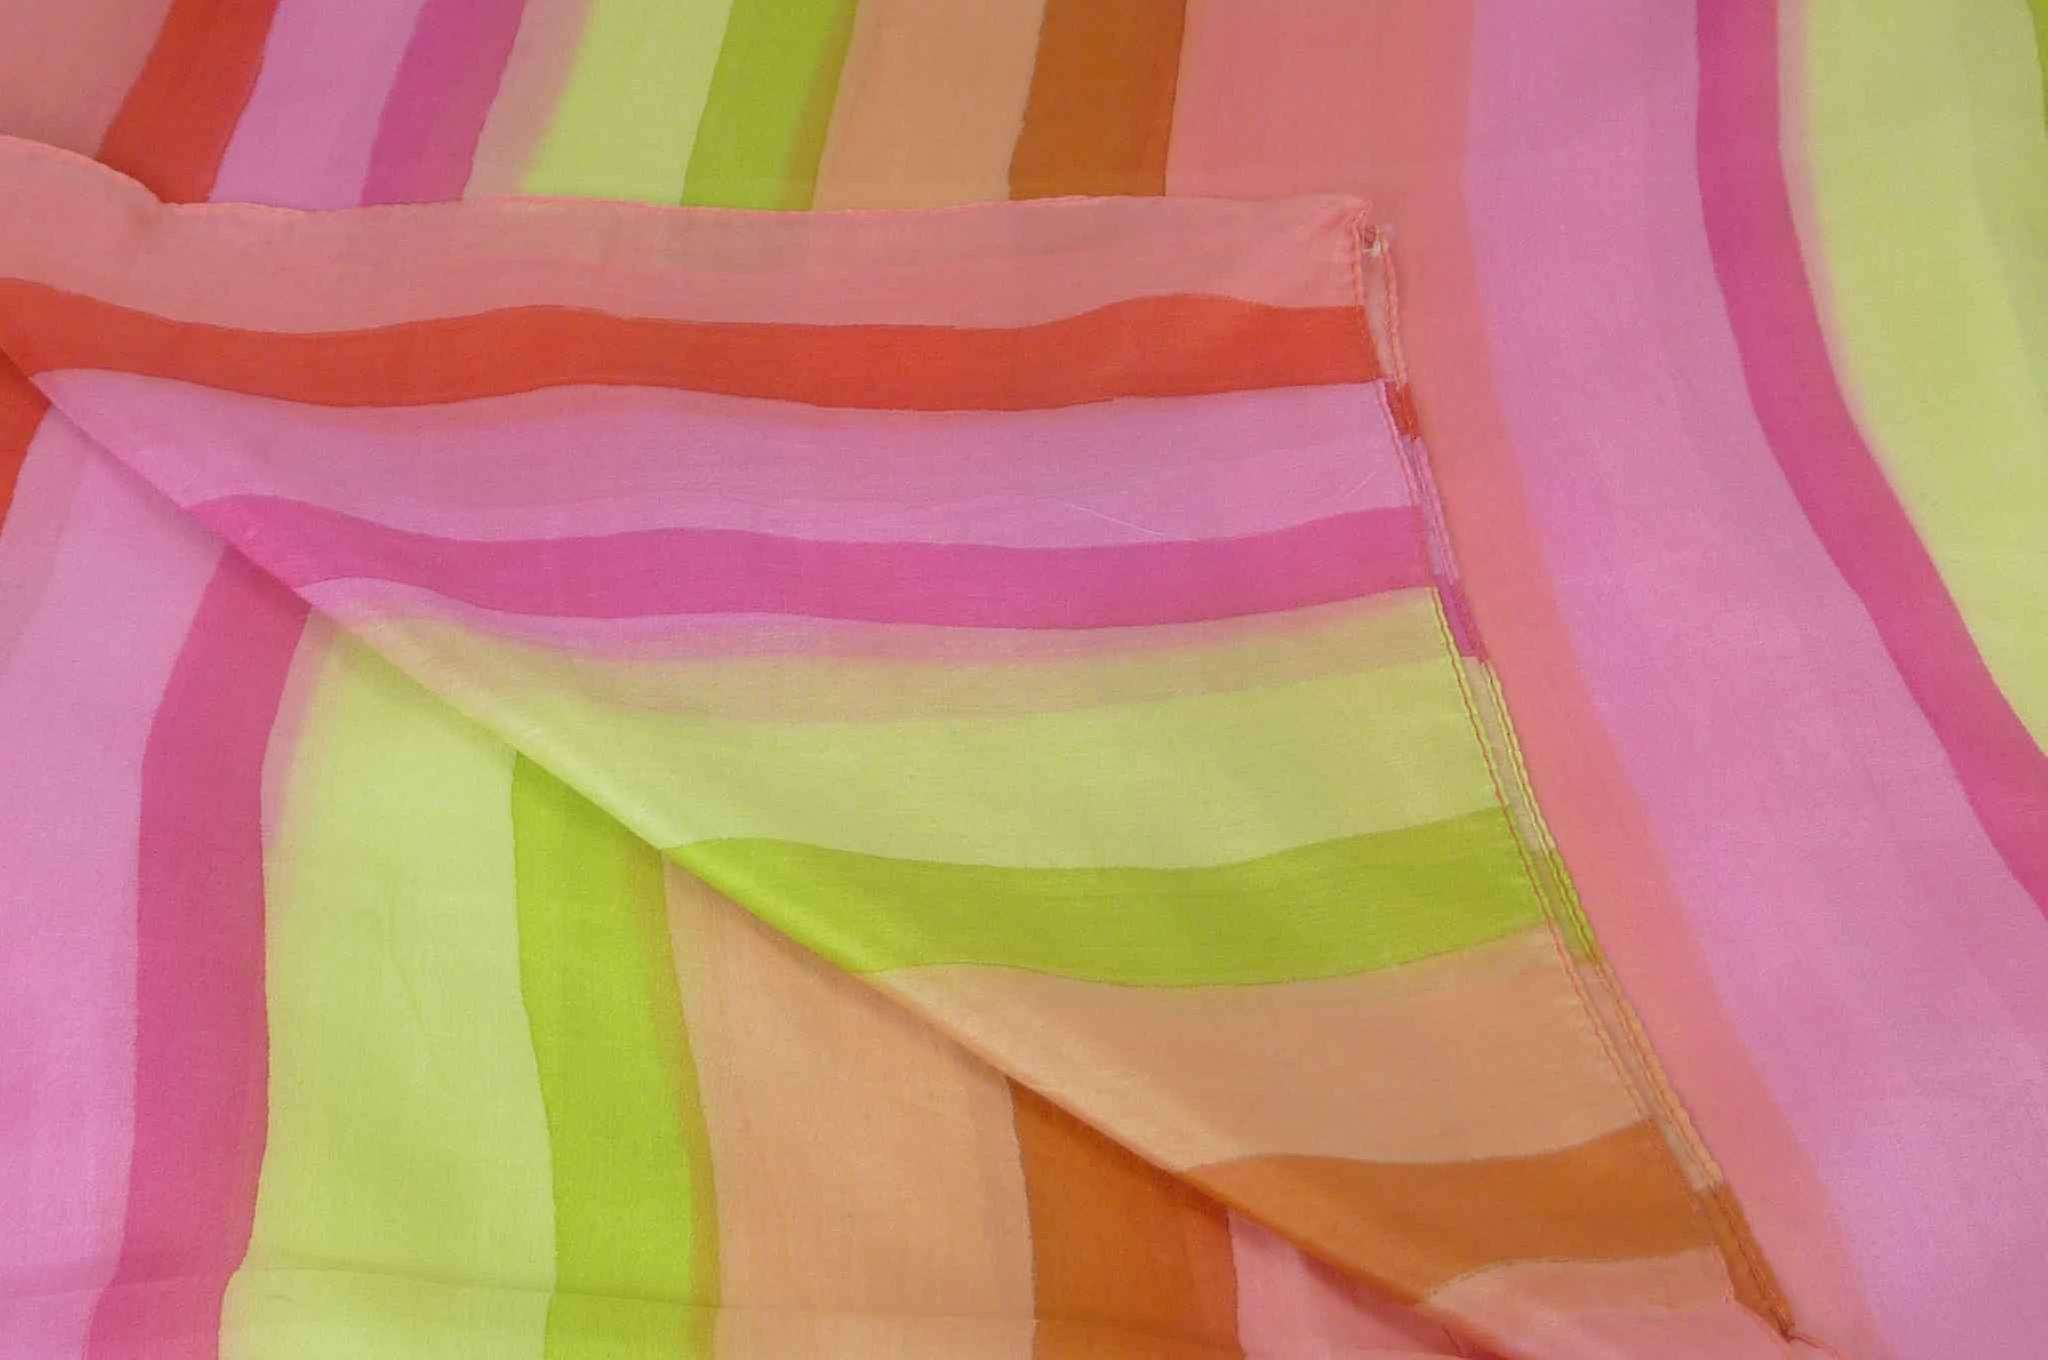 Mulberry Silk Classic Long Scarf Wassan Rainbow Palette by Pashmina & Silk